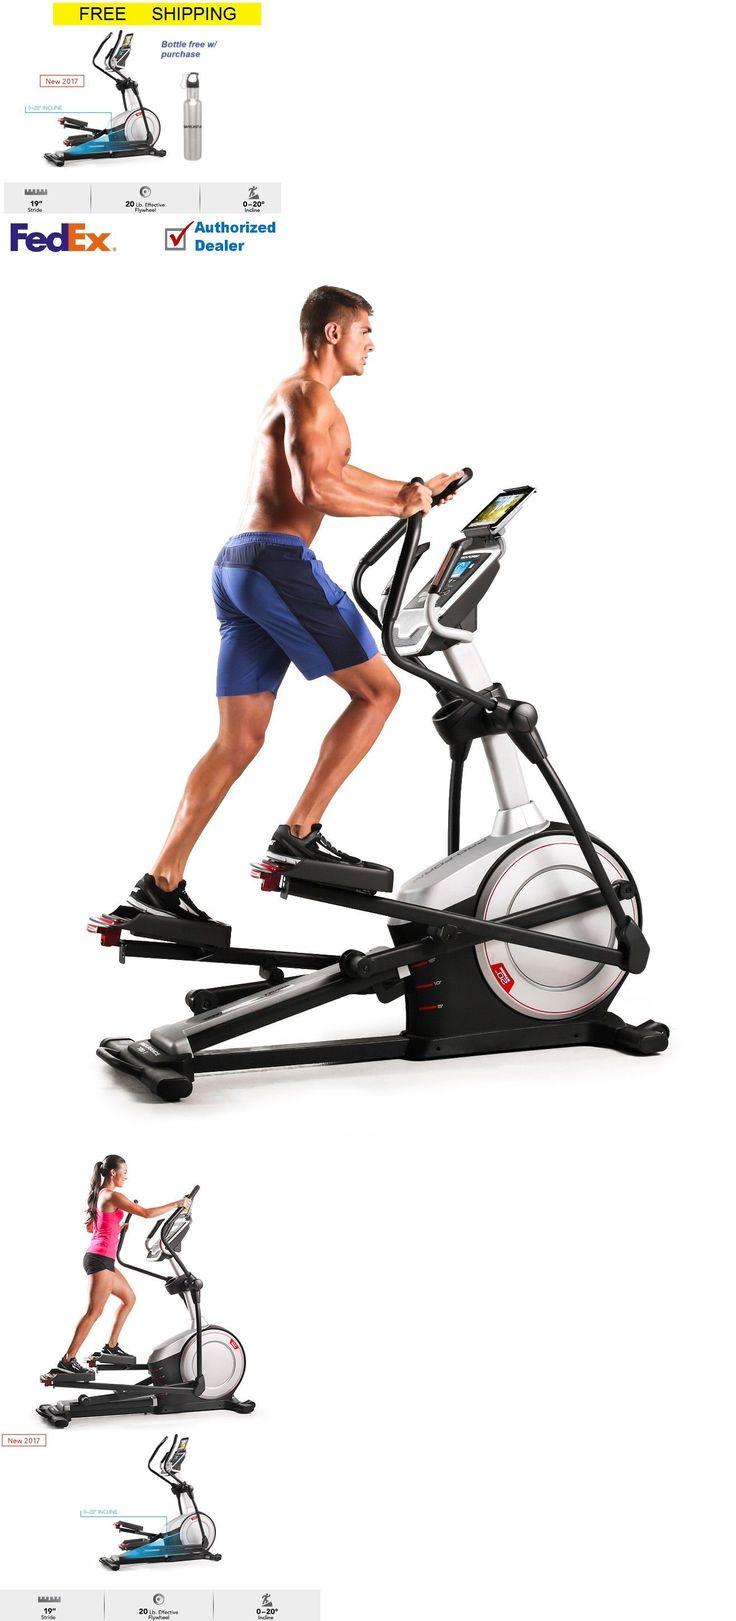 Ellipticals 72602: Proform Endurance720e Treadmill Pfel57916,Workout Running Machine W Free Bottle -> BUY IT NOW ONLY: $1999 on eBay!